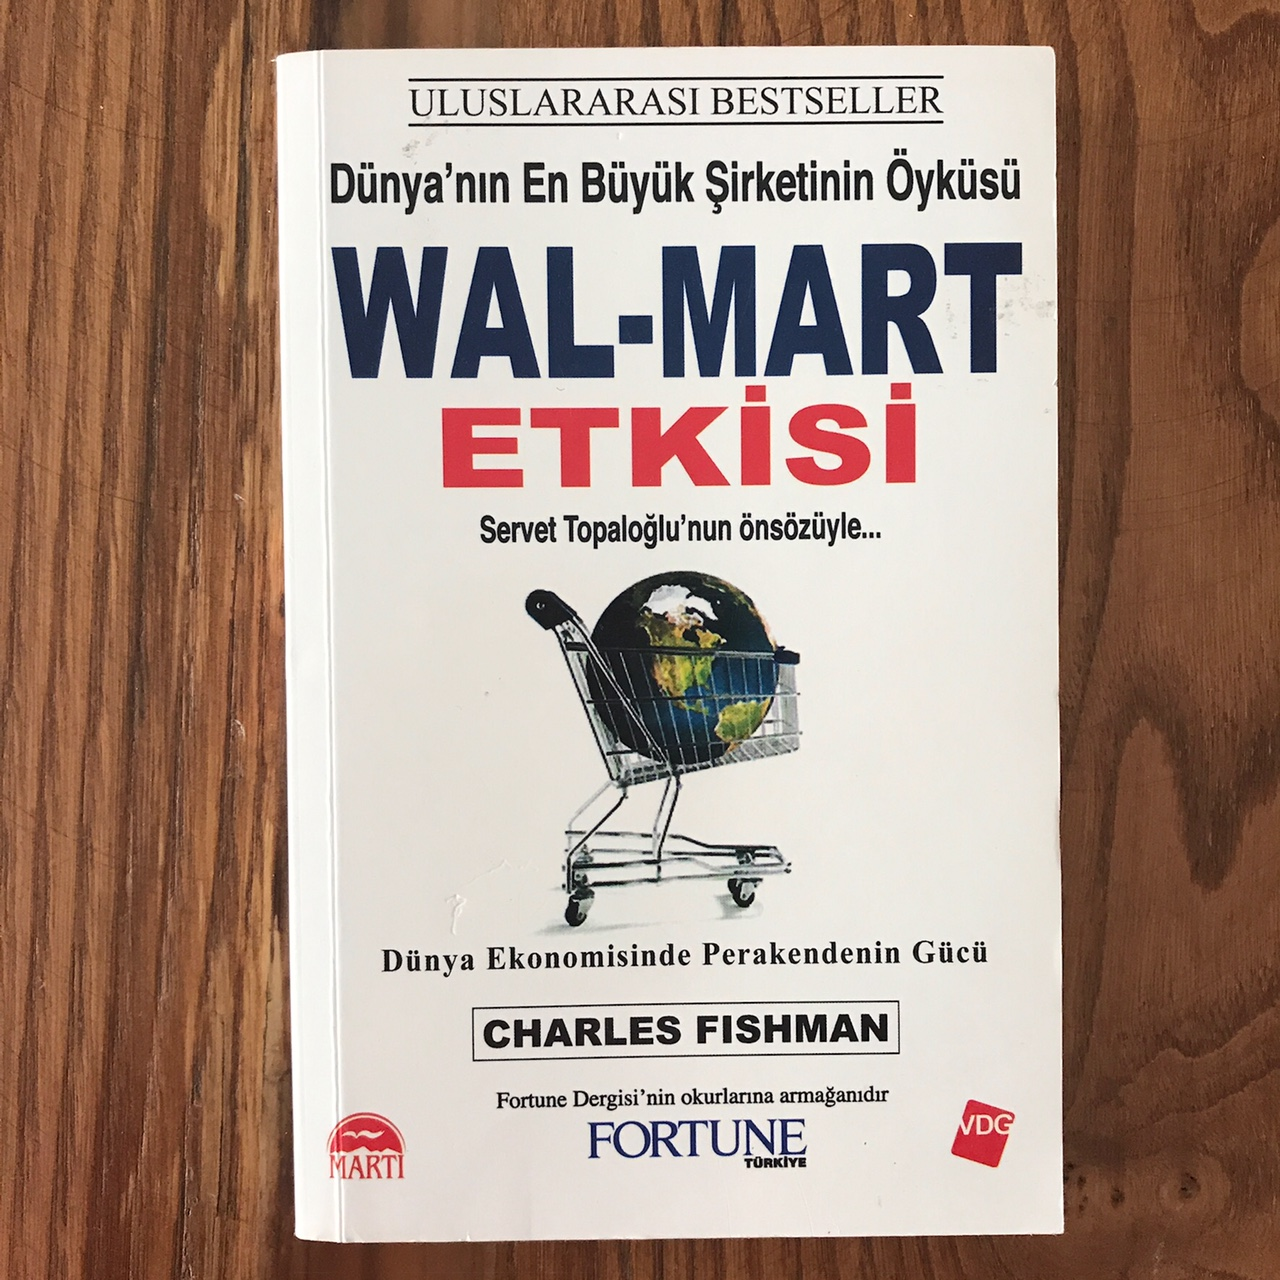 WalMart Etkisi - Dunya'nin En Buyuk Sirketinin Oykusu (Video) (Kitap)